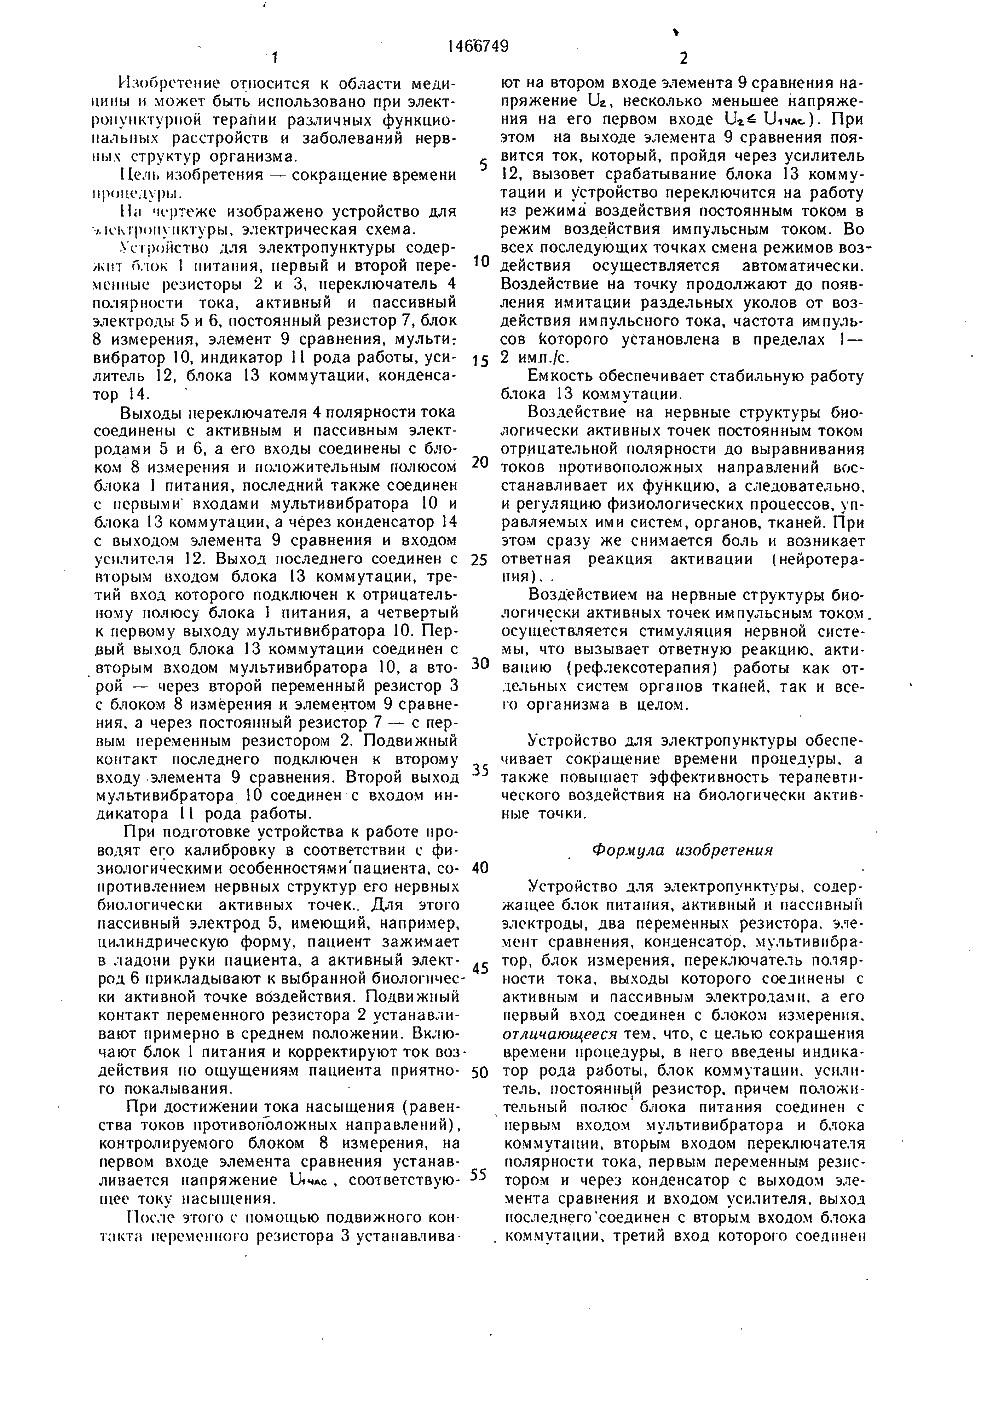 http://sf.uploads.ru/bMKdE.jpg